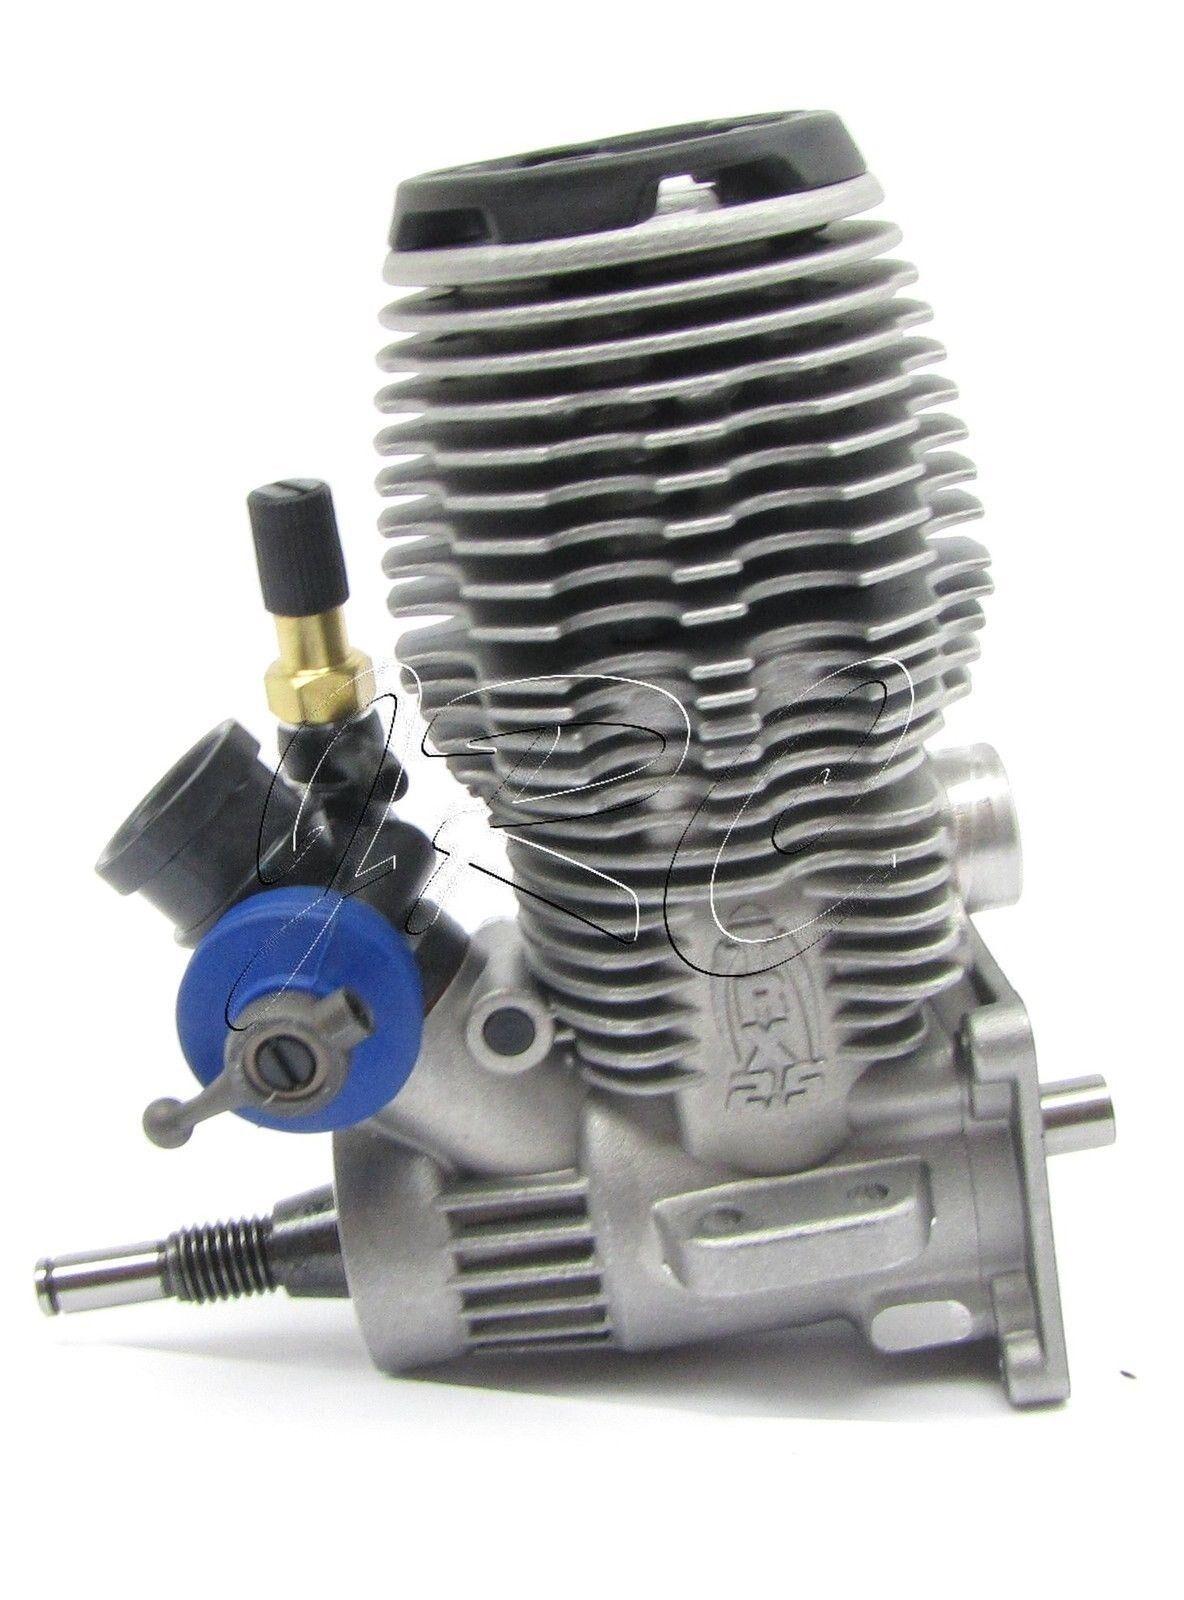 classeIC  T-maxx 2.5 ENGINE (TMAXX TRX 5207R) Traxxas 49104  negozio online outlet